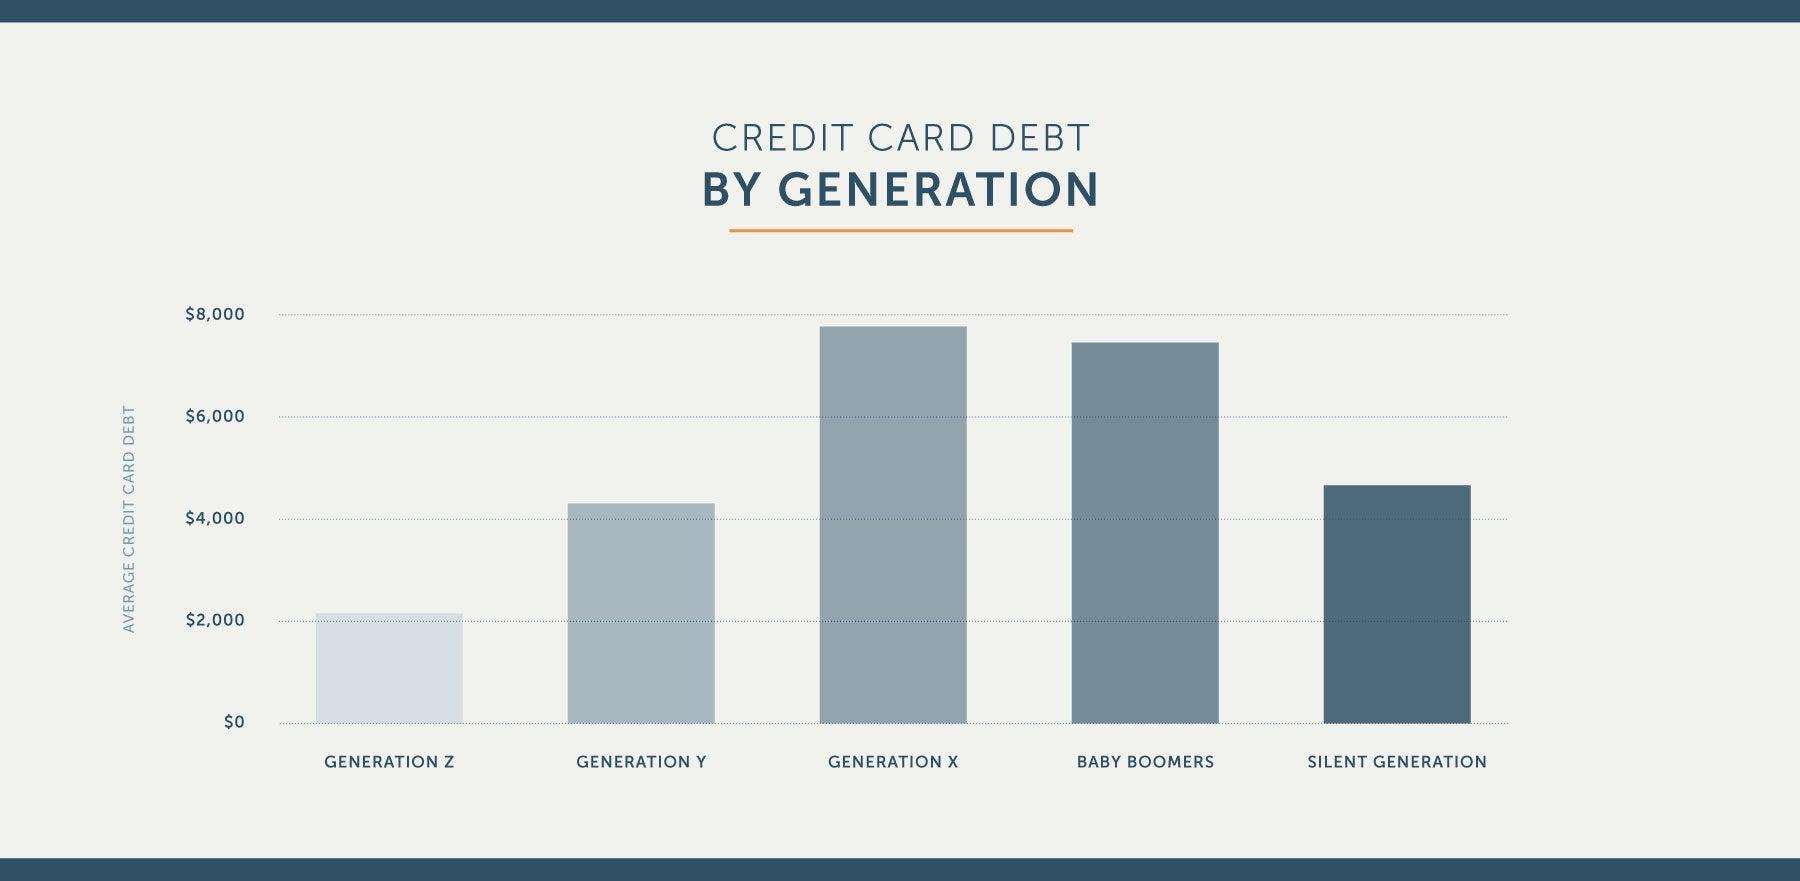 american credit card debt by generation in america